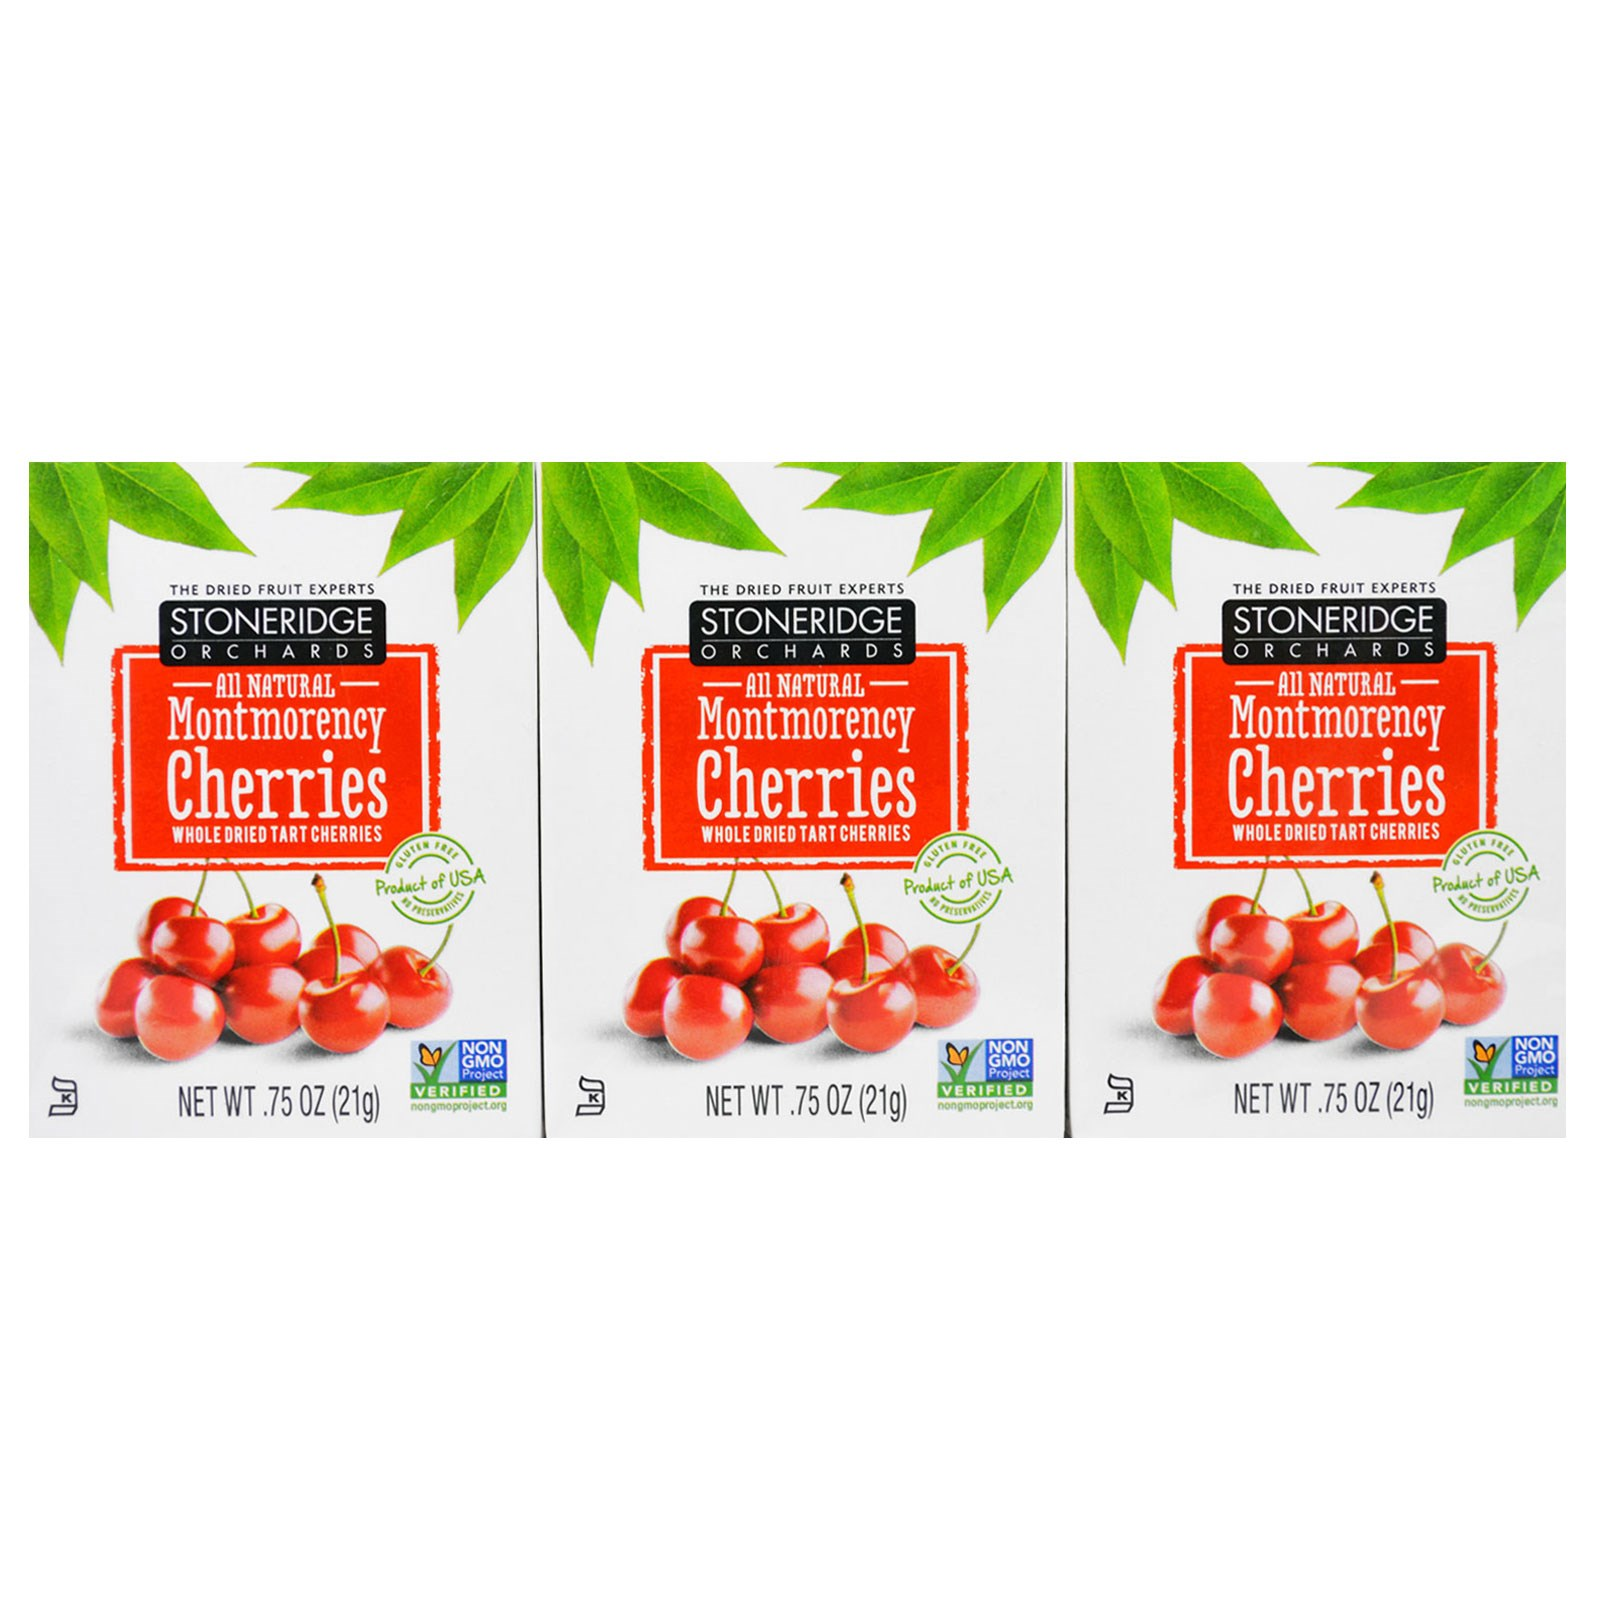 Stoneridge Orchards, Montmorency Cherries, Whole Dried Tart Cherries, Brick Pack (6 Boxes), 0.75 oz (21 g) Each